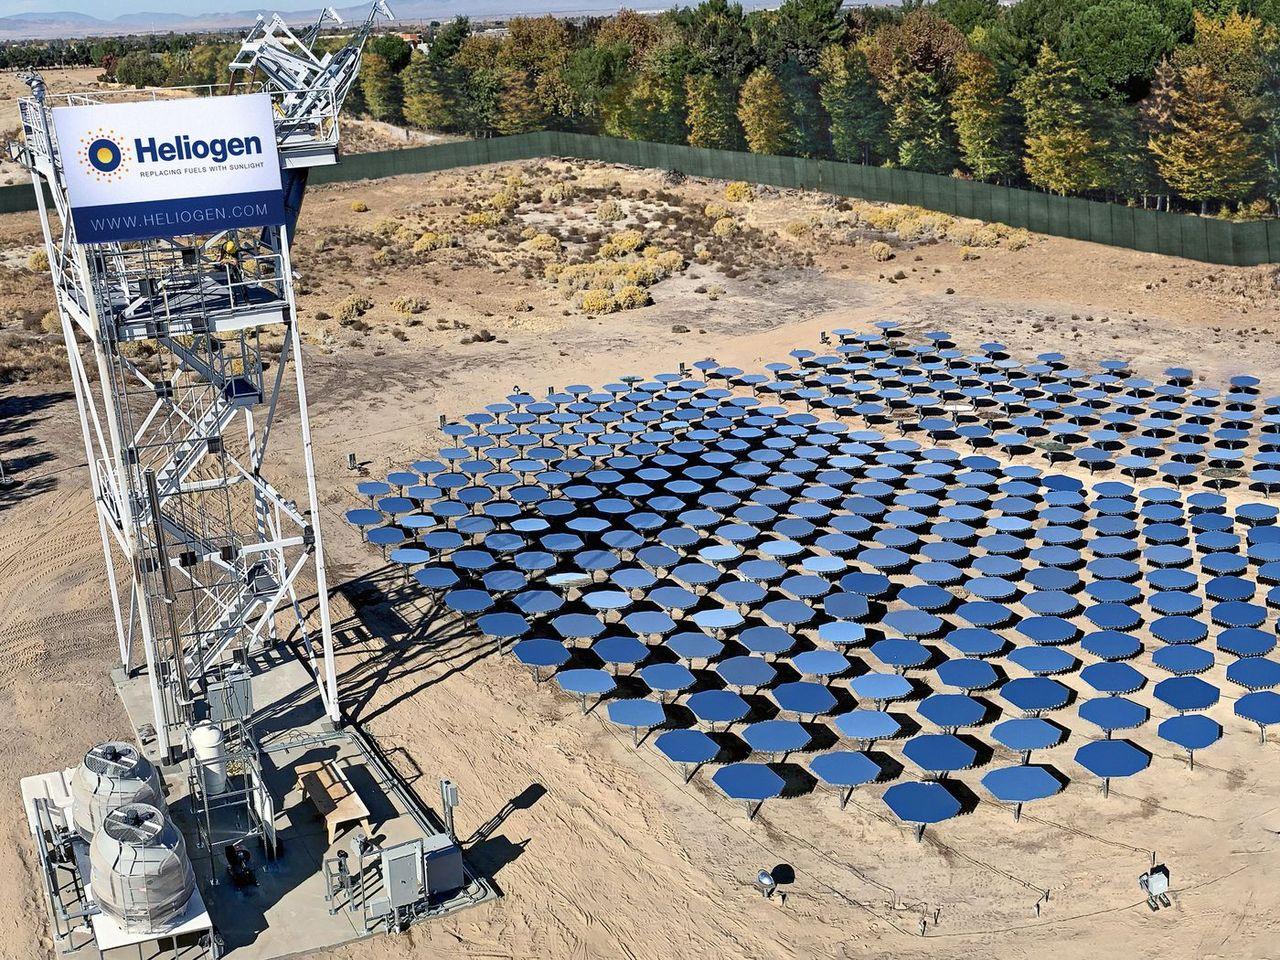 Heliogens solenergi-lösning kan smälta metall